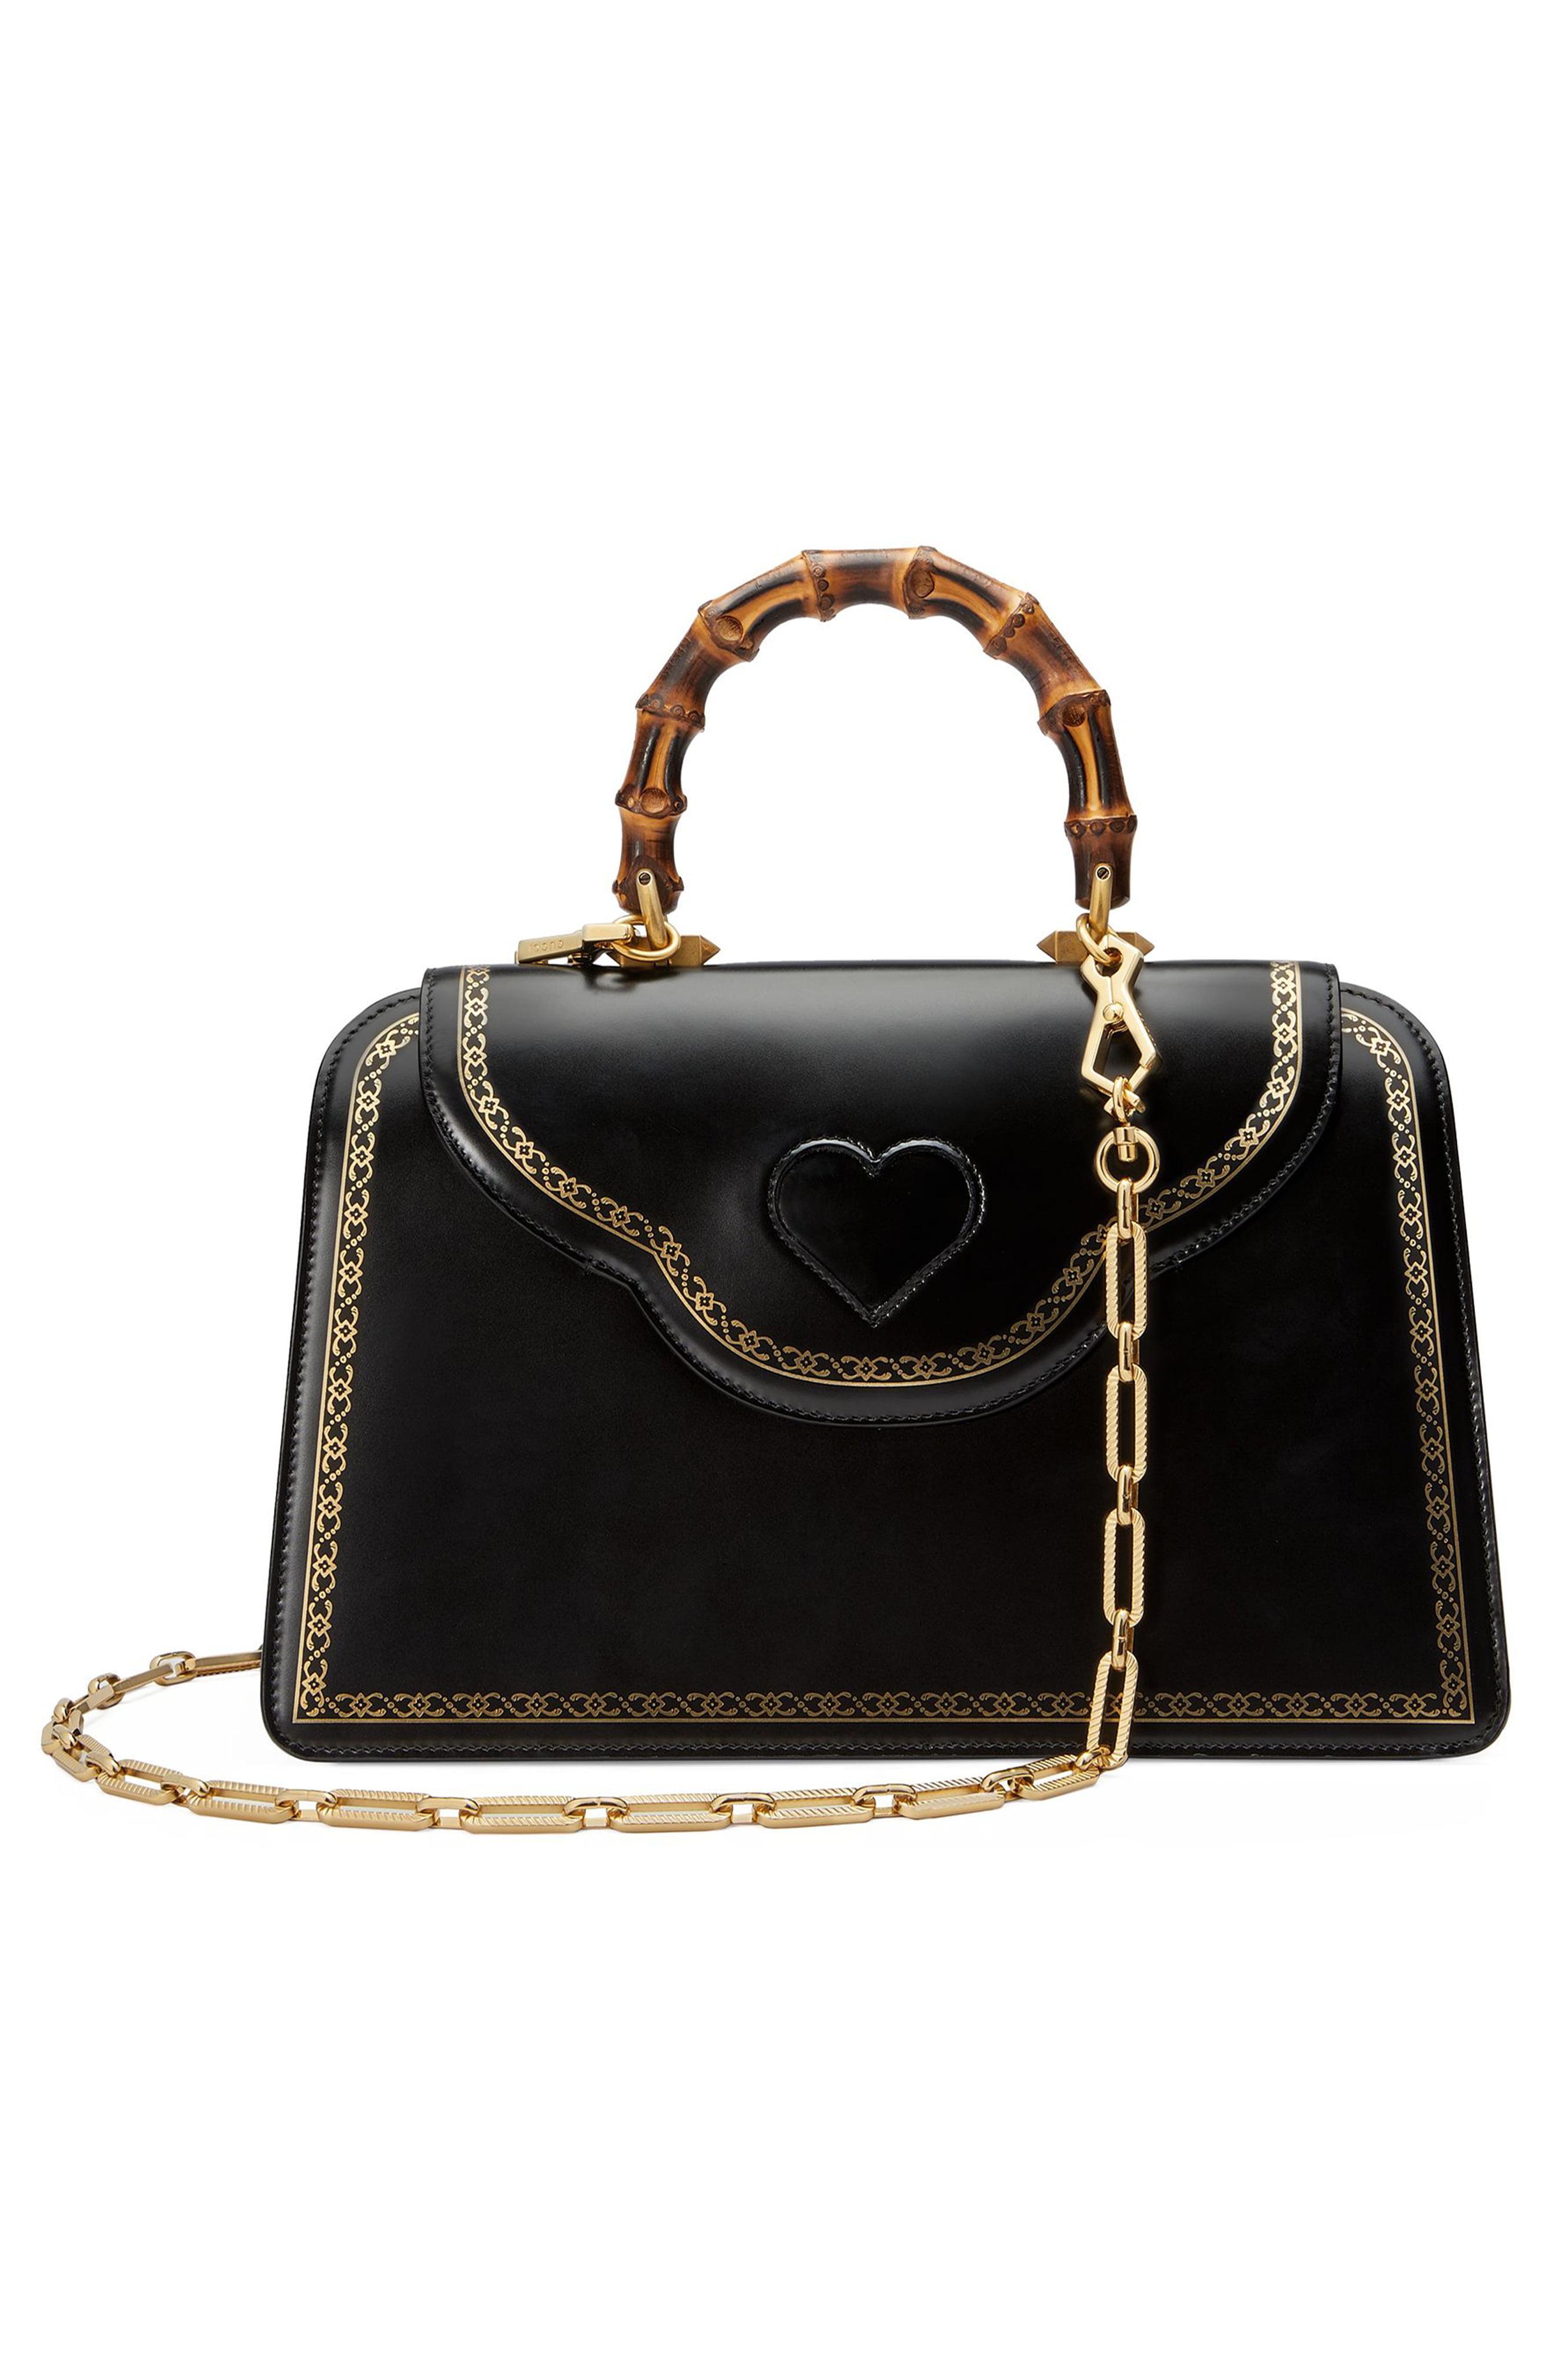 5fb0fc21fae Gucci - Black Thiara Medium Leather Top Handle Bag - - Lyst. View fullscreen